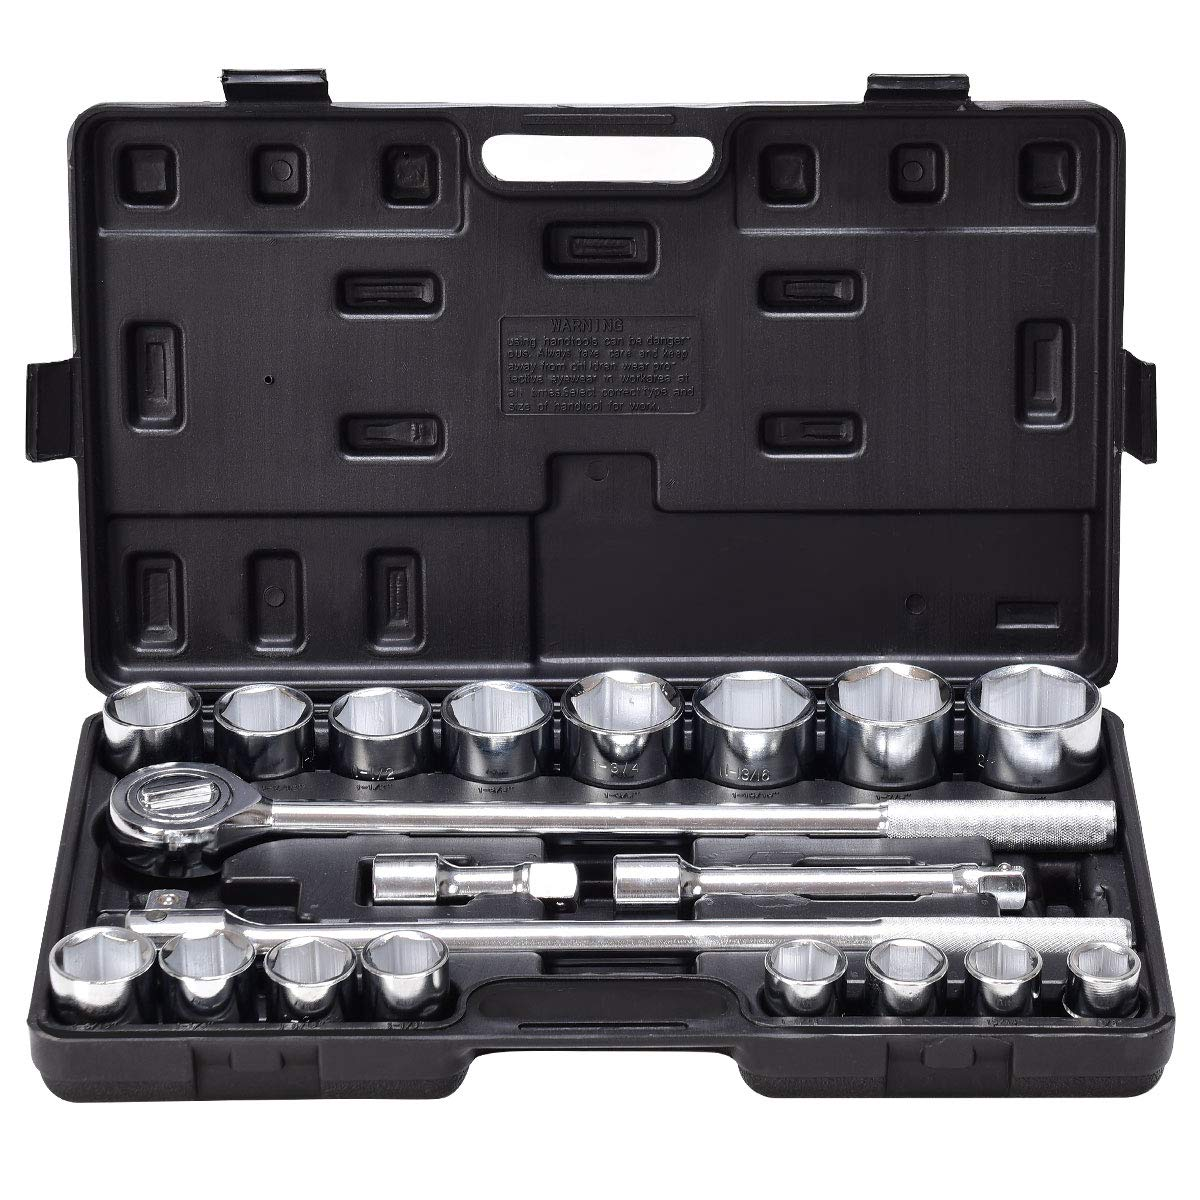 Goplus 21pcs SAE 3/4'' Drive Socket Set w/Case Jumbo Ratchet Wrench Extension (21pcs)